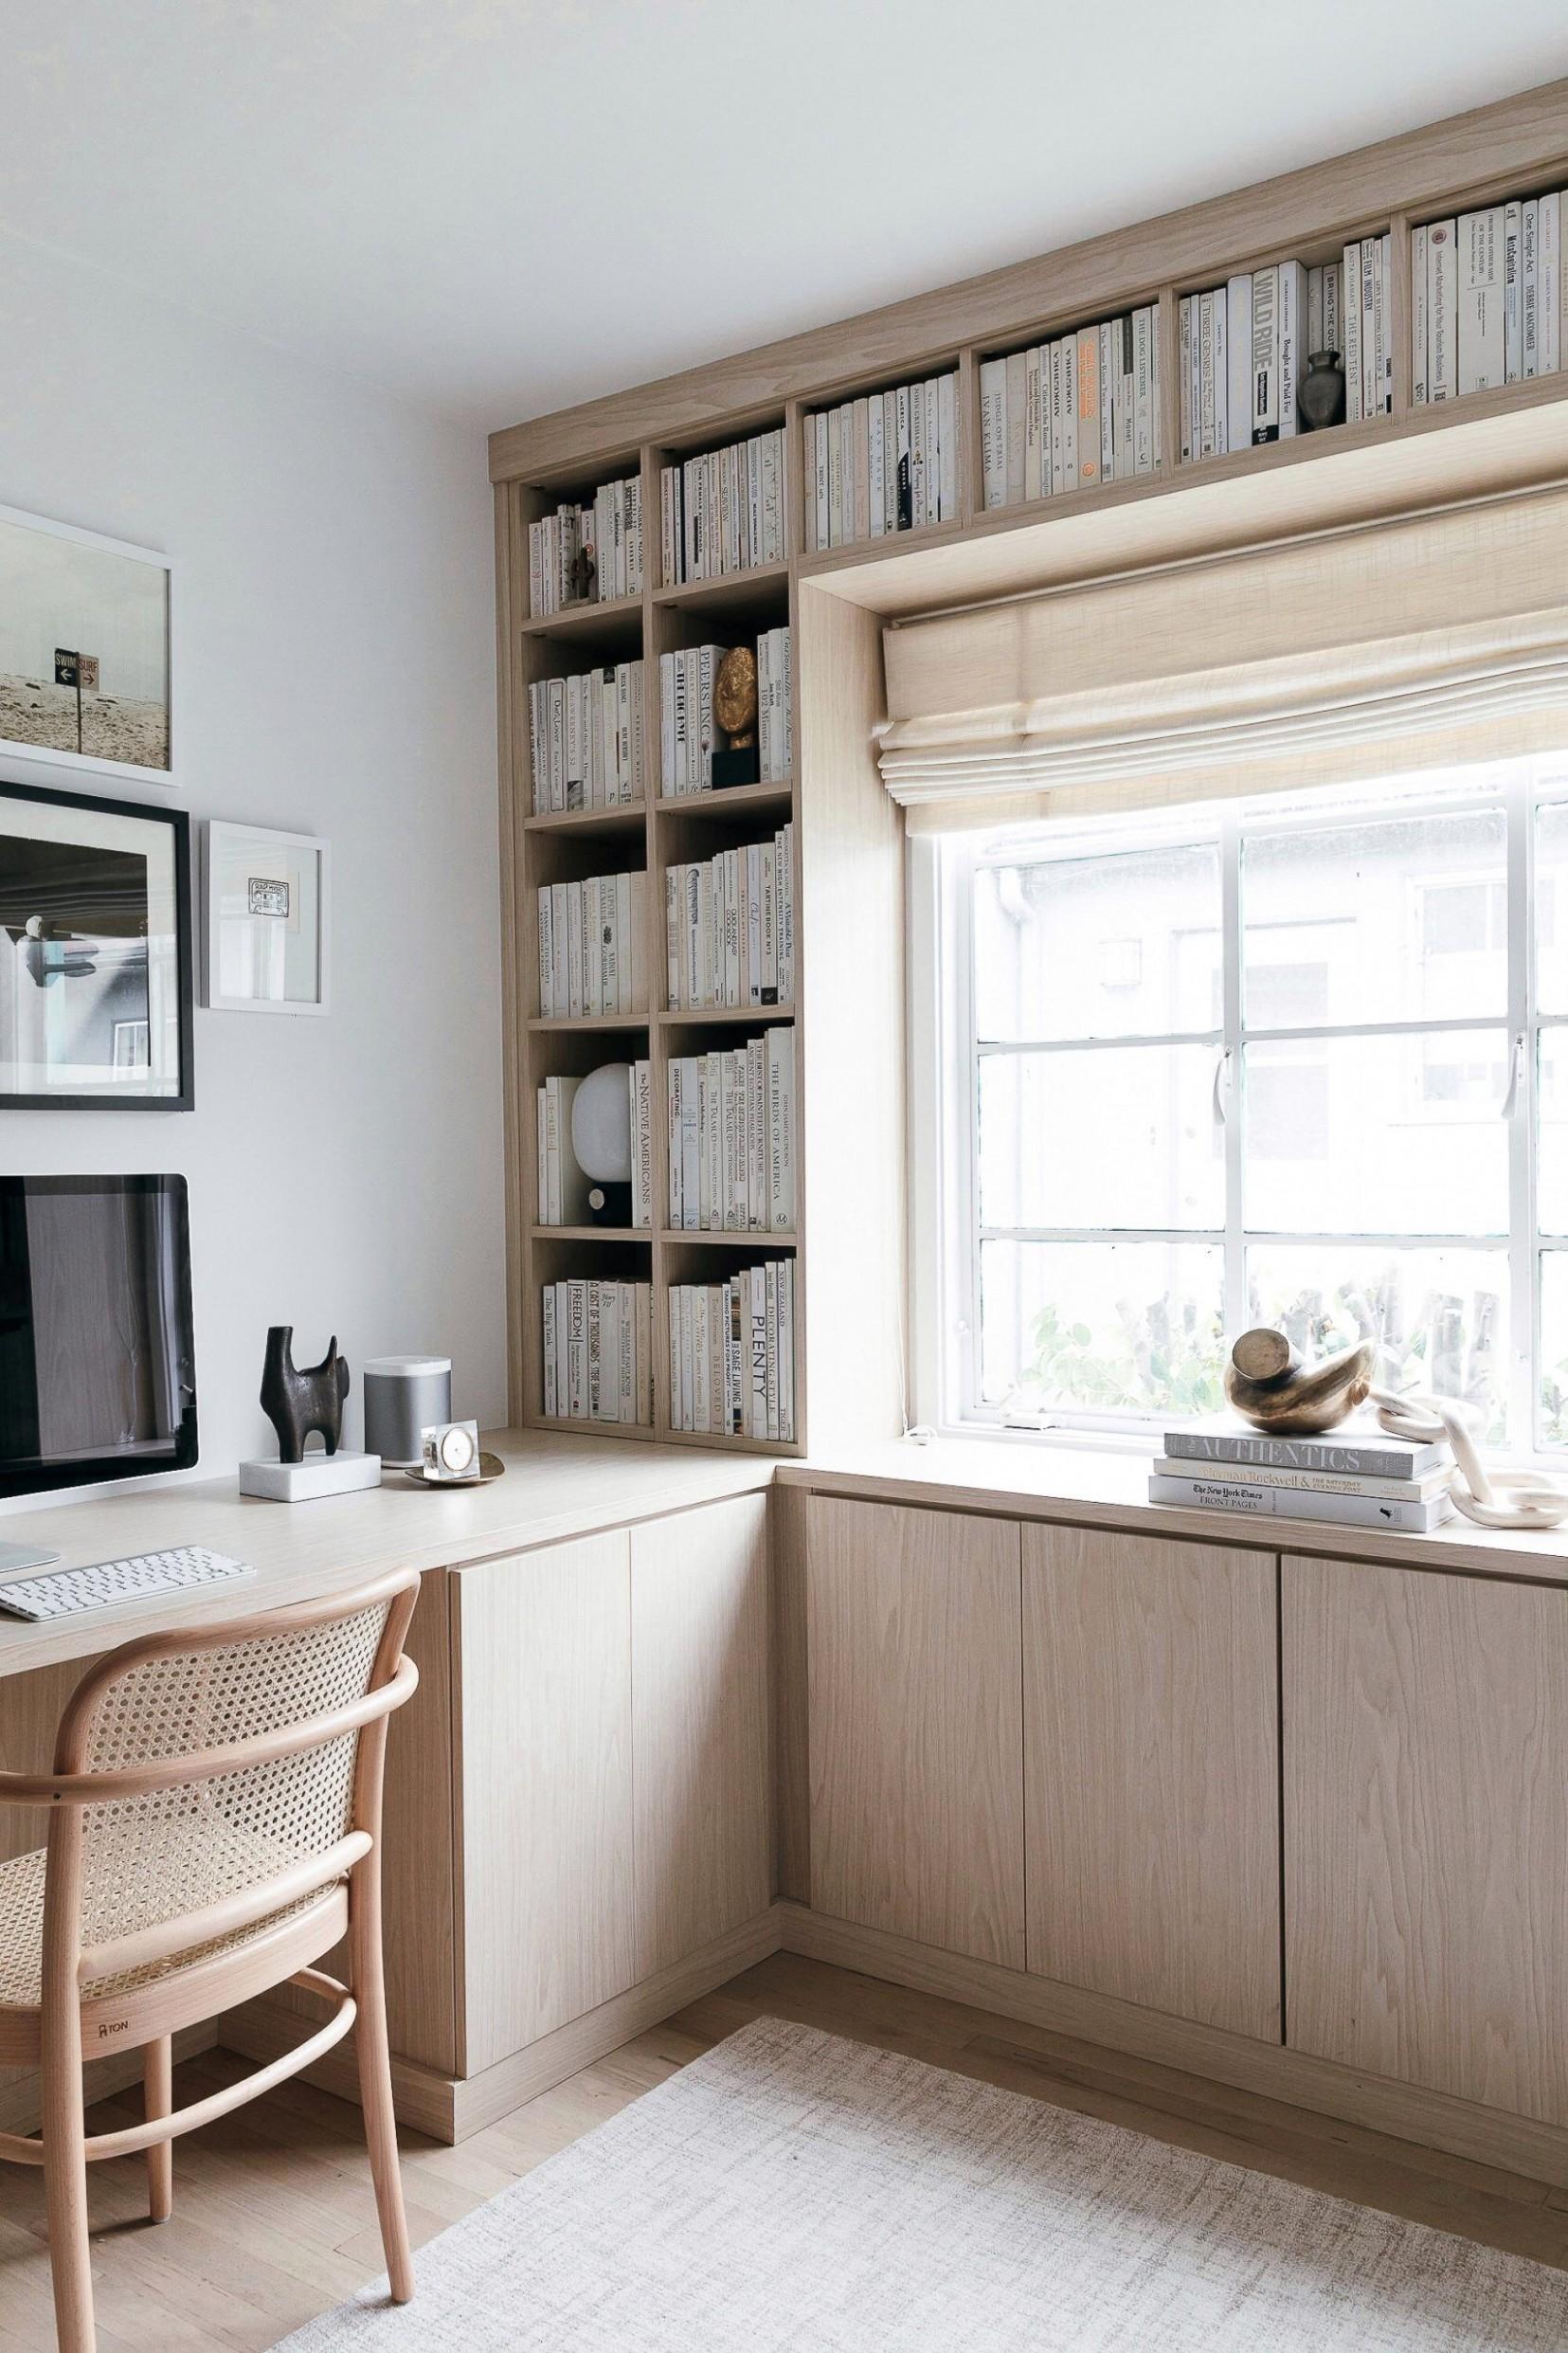 Bookshelves for Office 12 in 12  Office interior design, Home  - Home Office Design Ideas 2021